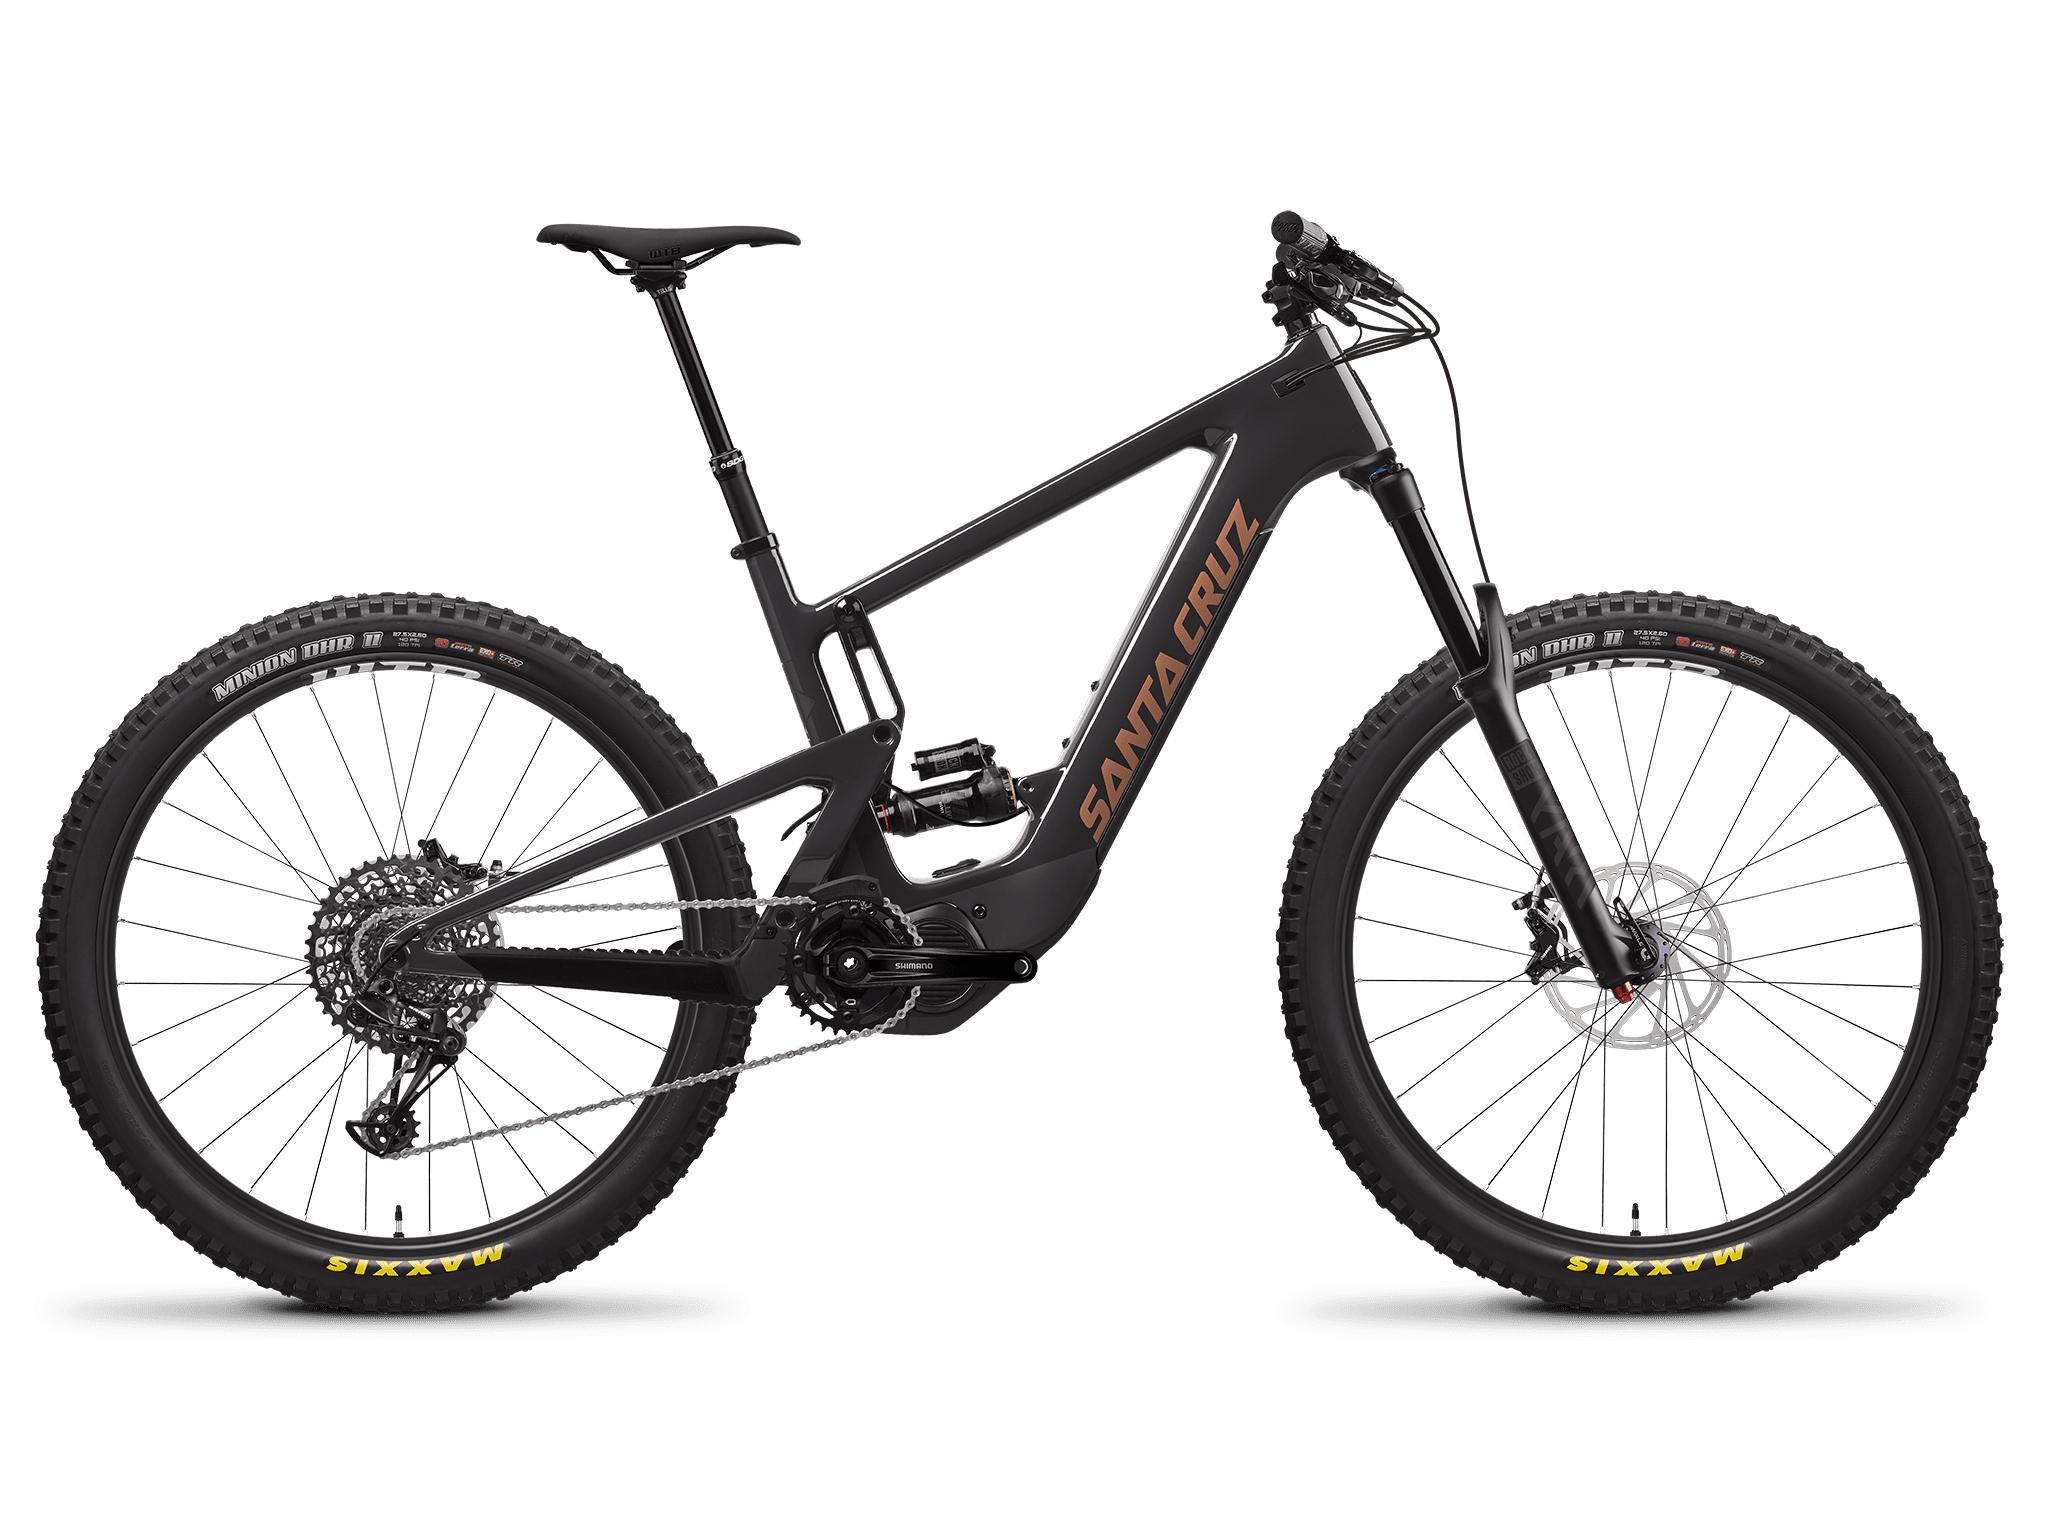 Image of Santa Cruz Heckler MX R Electric Mountain Bike 2022 Carbon